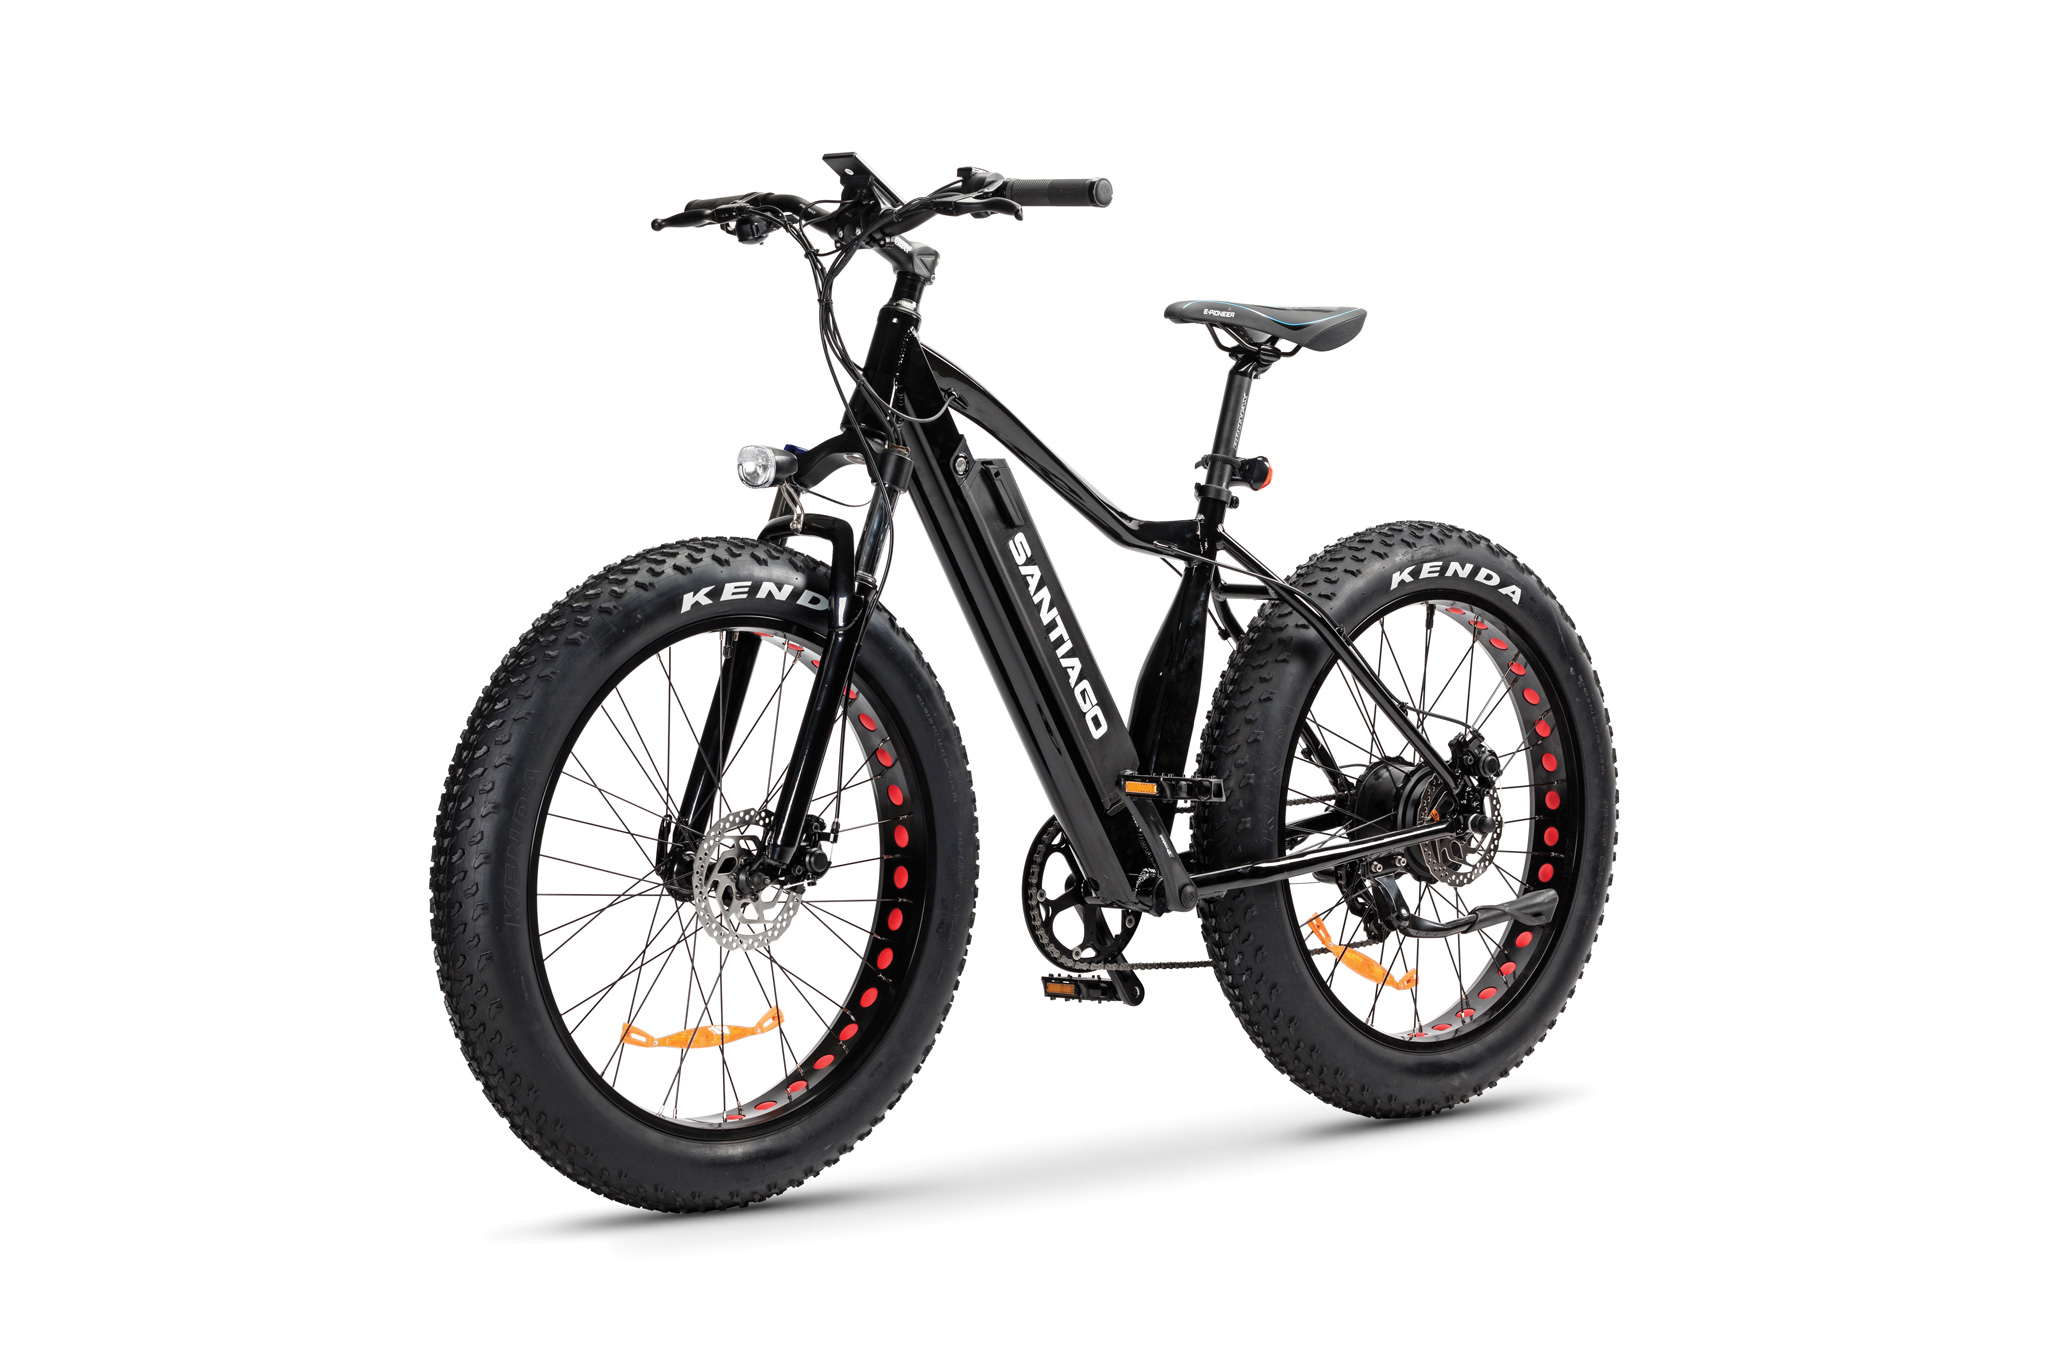 The Santiago Fat E-Bike Black